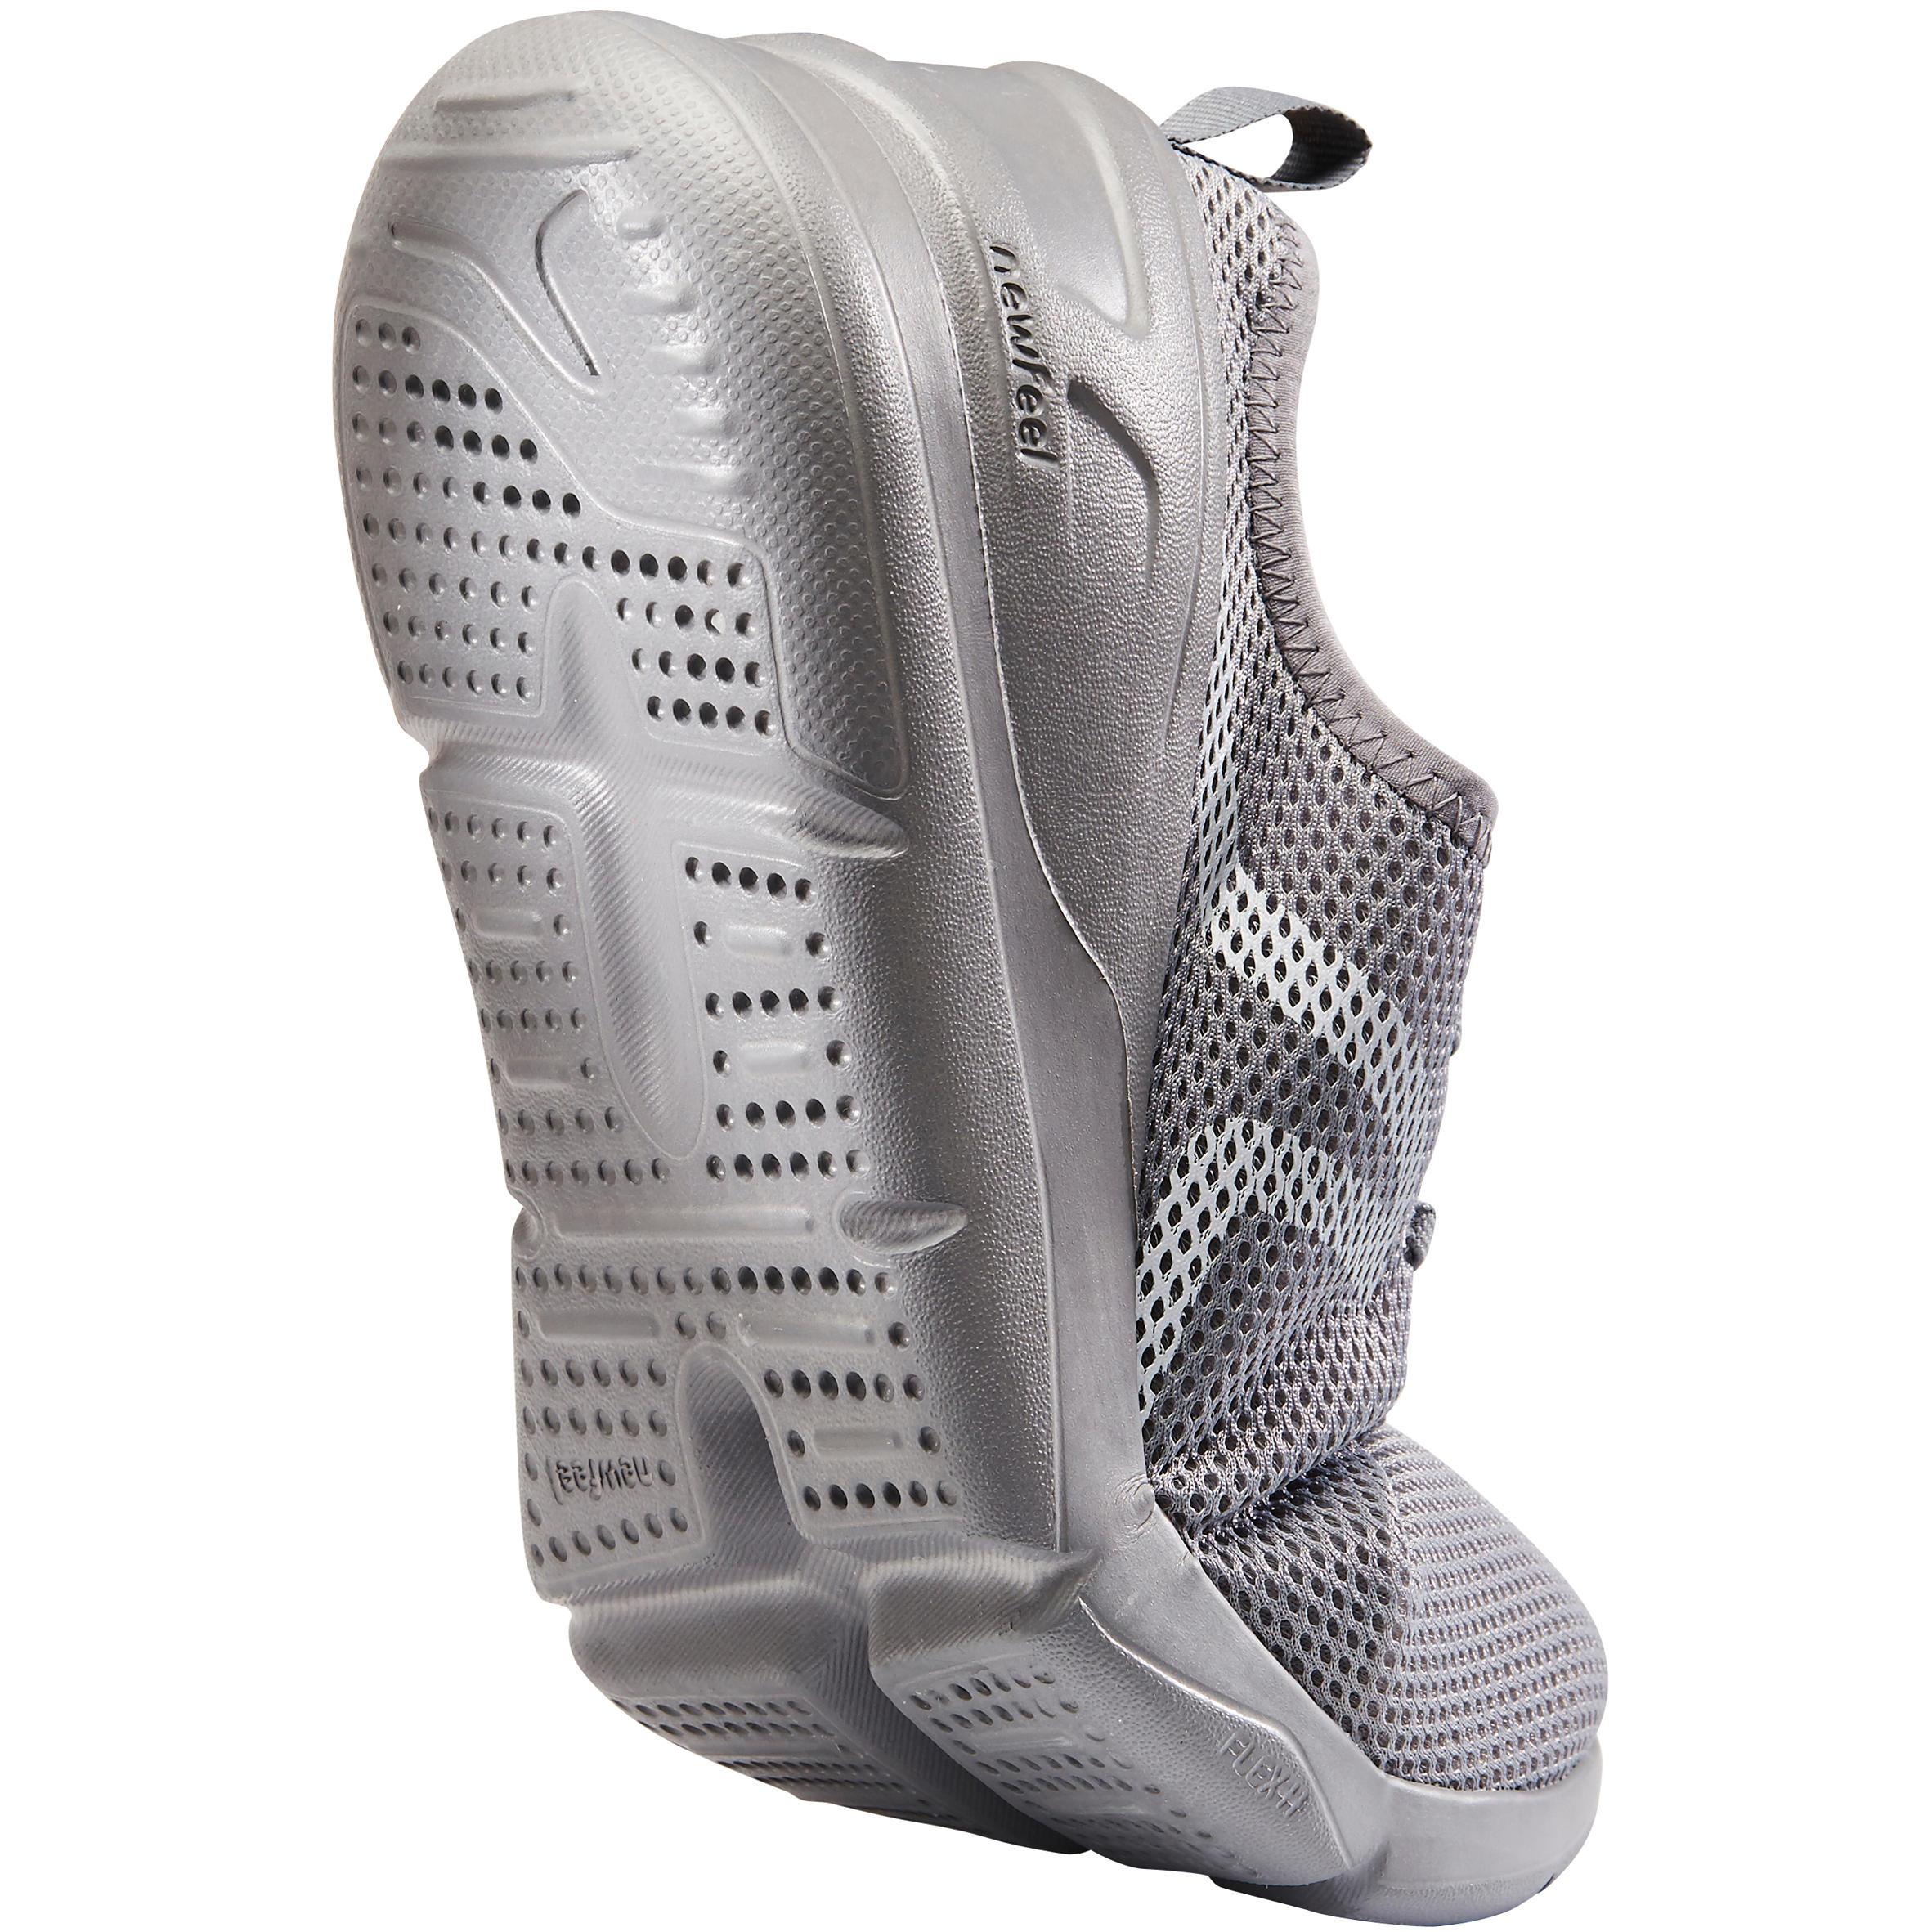 PW 100 Men's Fitness Walking Shoes - Grey